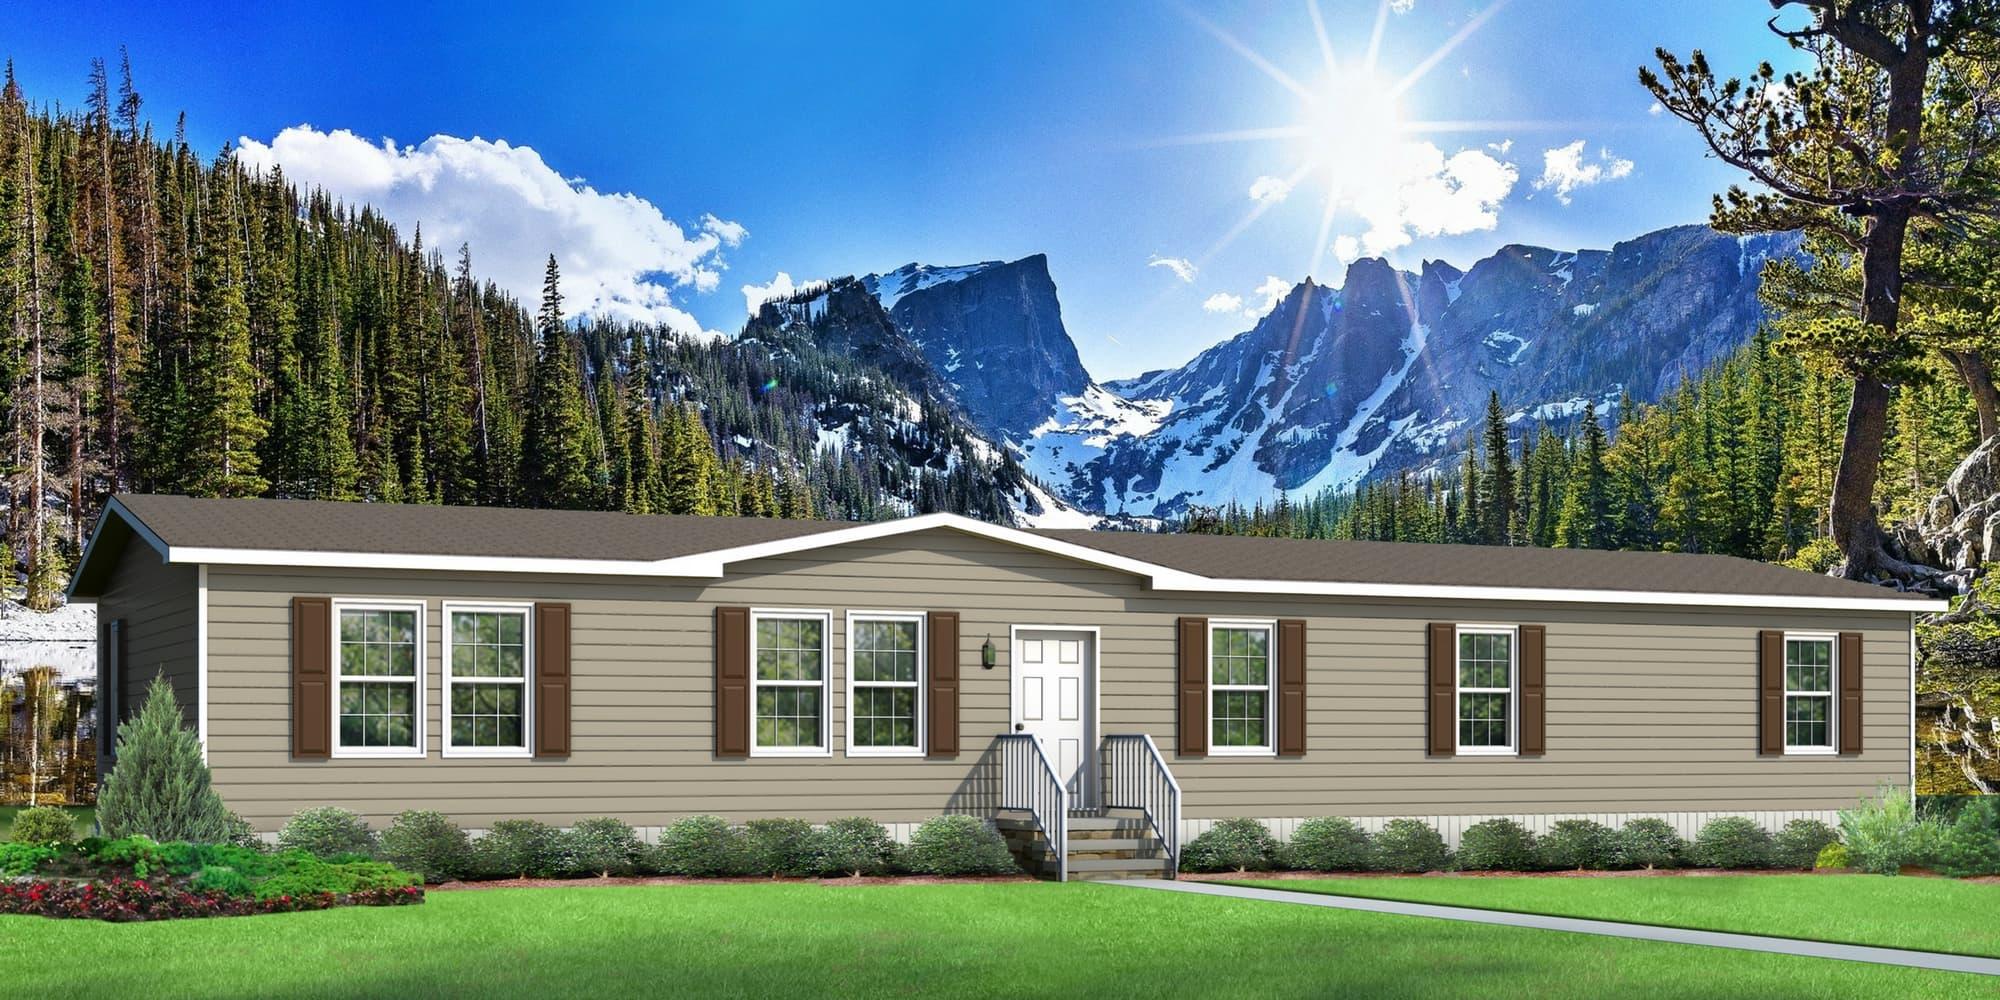 1 100 Usda Manufactured Home Loans Usda Rural Development Loans Manufactured Nationwide 1 Manufactured Home Loan Lender In All 50 States